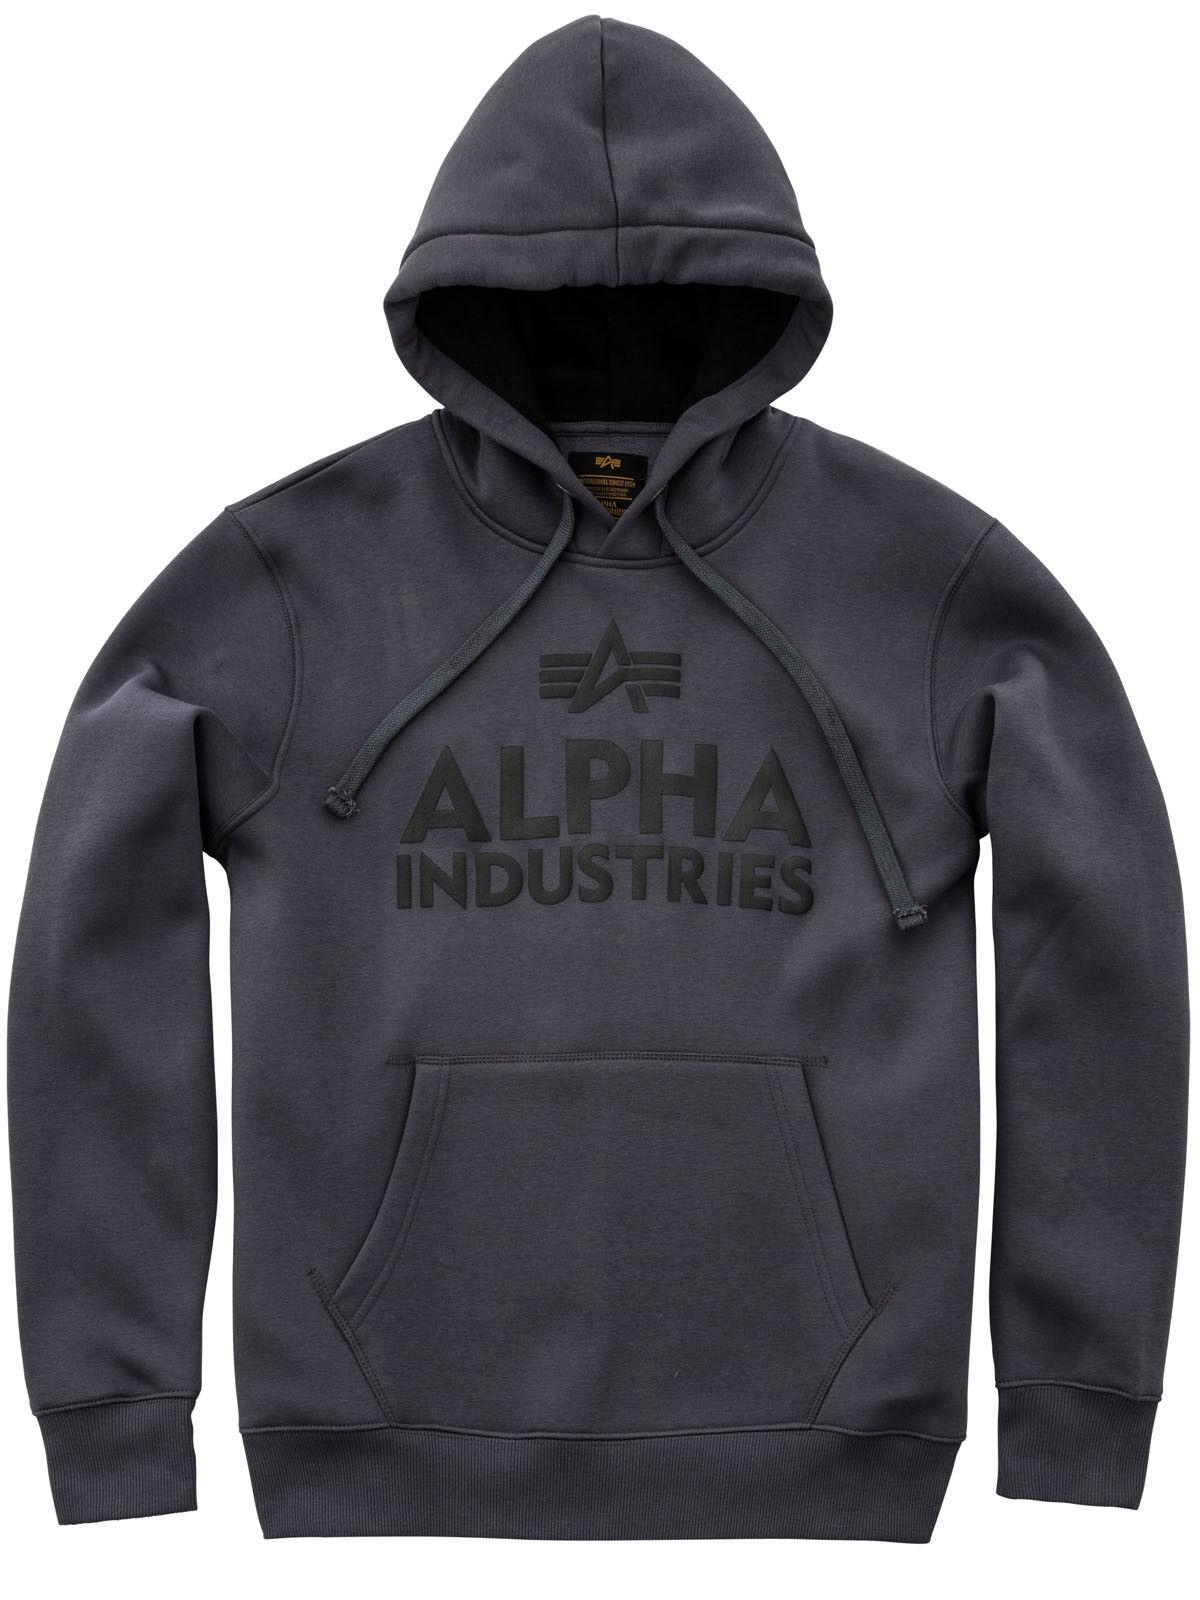 Alpha Industries 136 Foam Print Hoody Capuche Gris 143302 136 Industries #6190 eda766